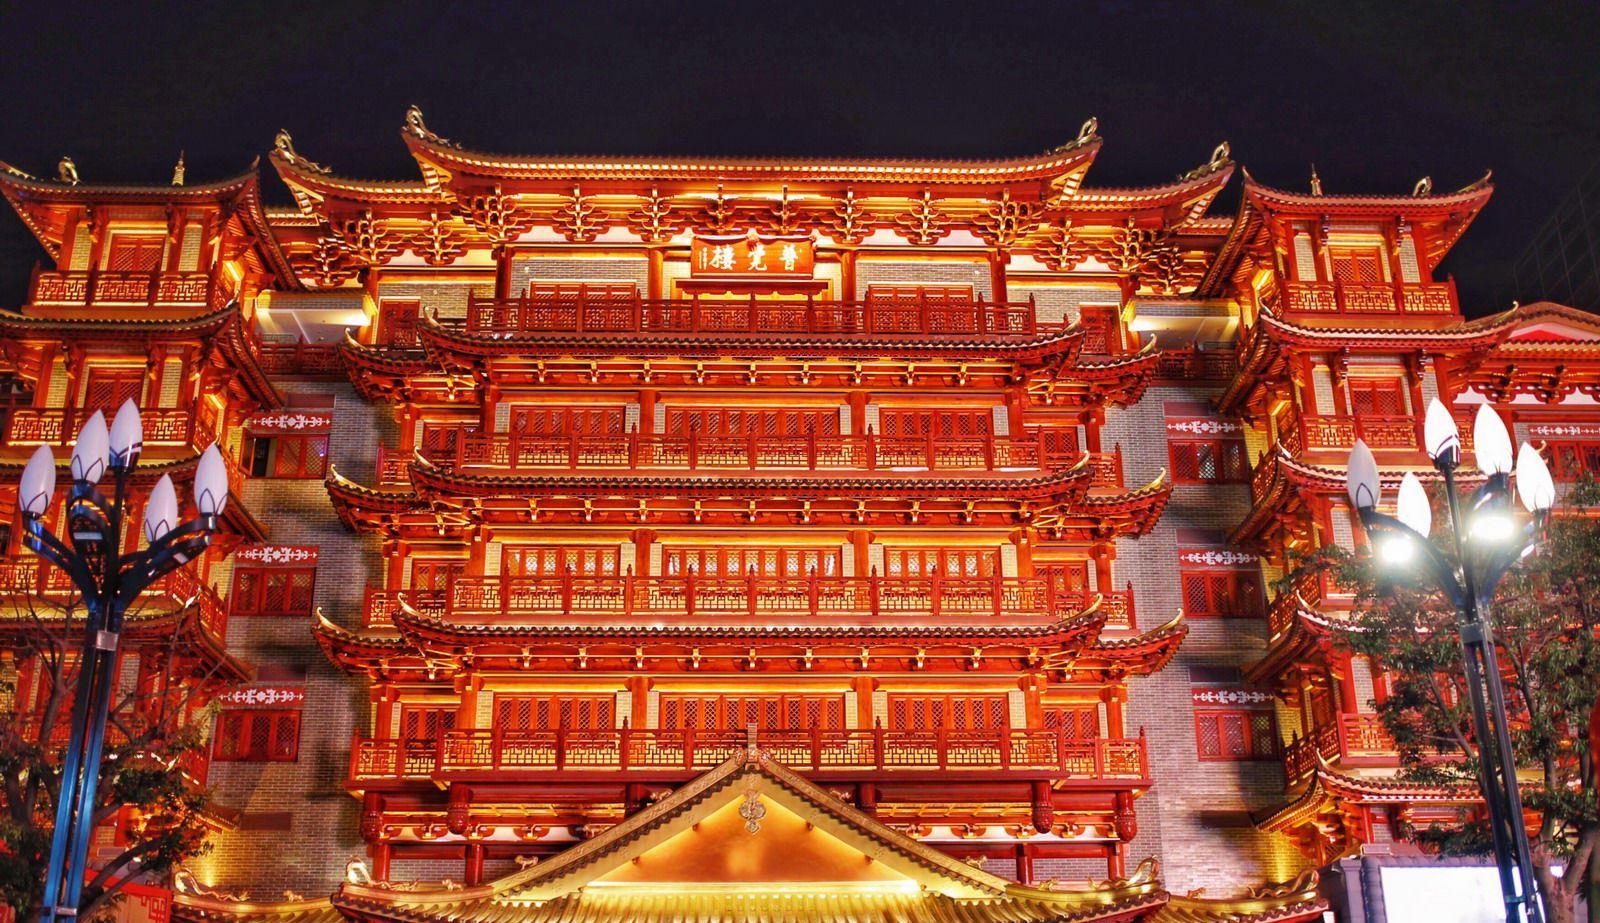 Храм Будды или Храм Дафо, гуанчжоу, Китай